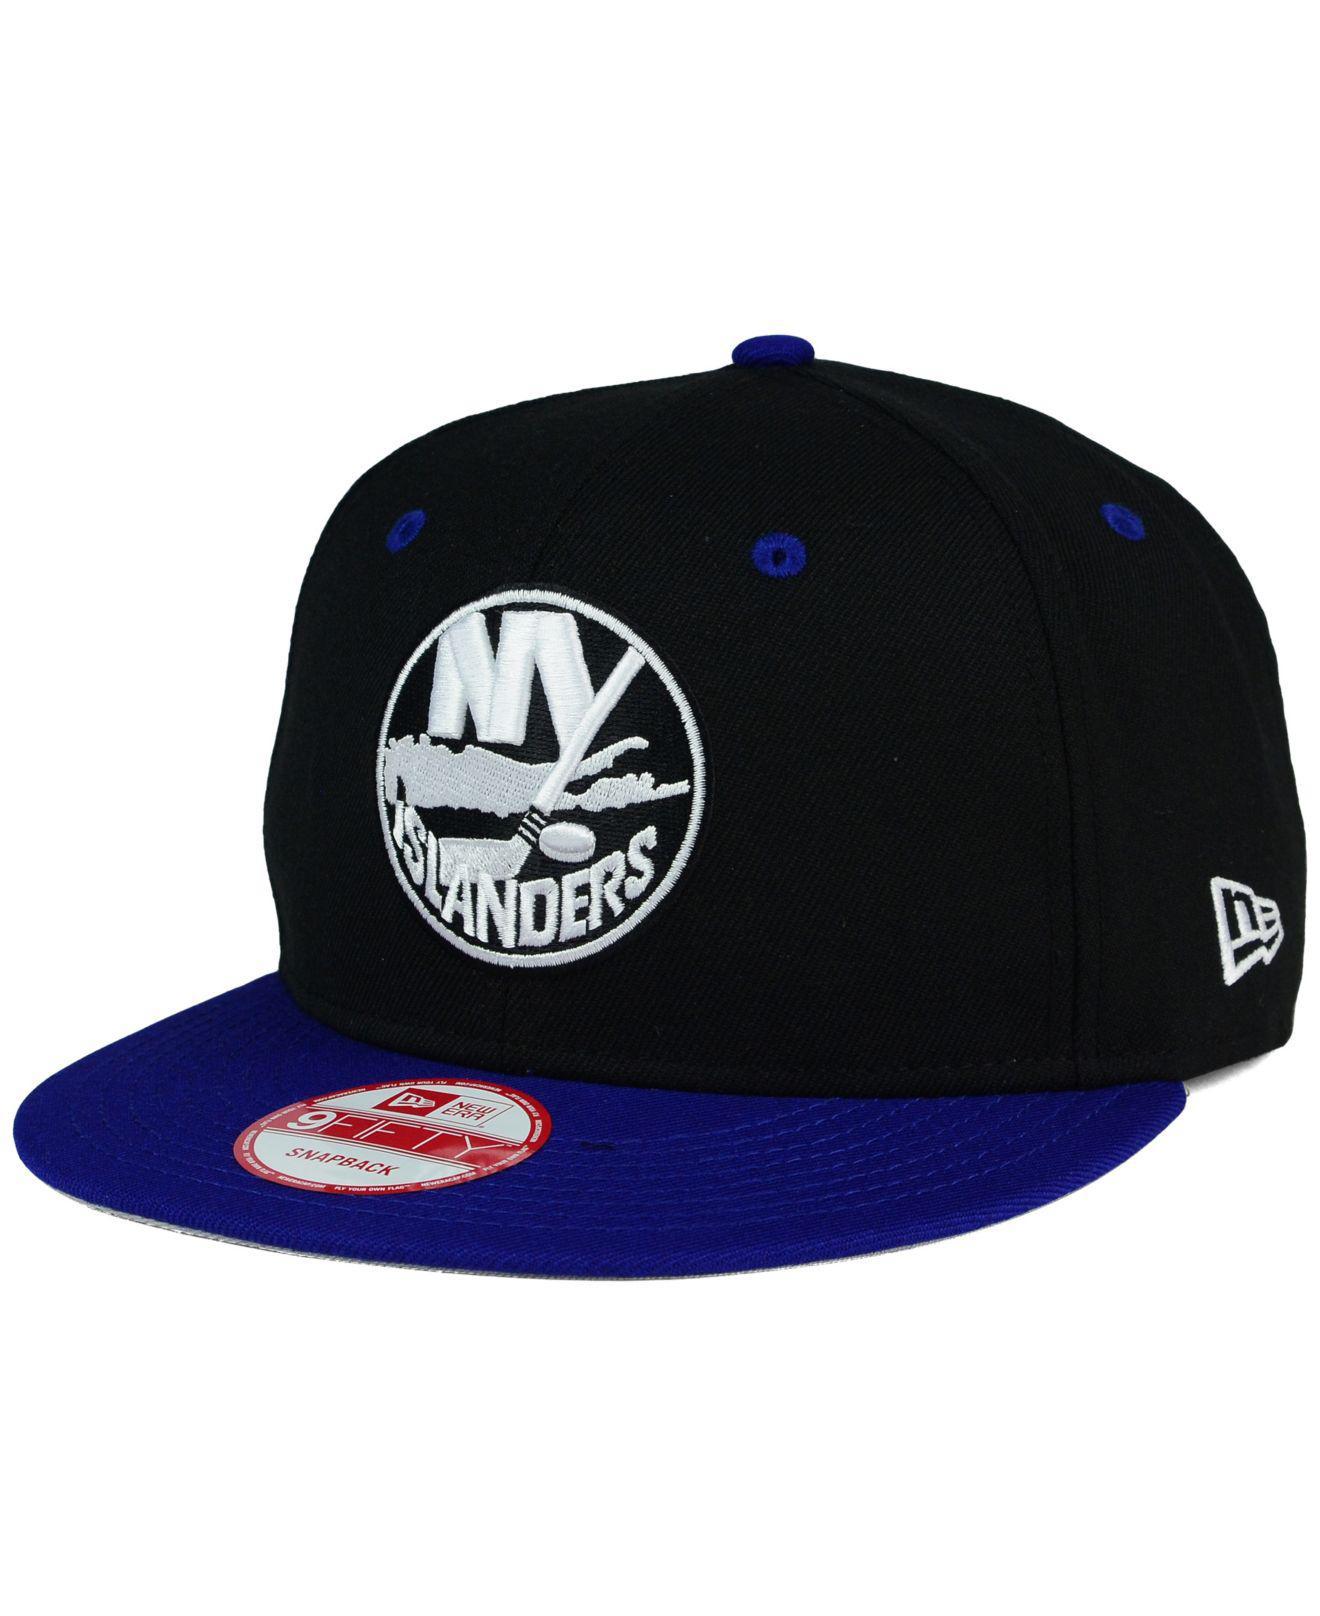 88cb305e4bd KTZ. Men s Blue New York Islanders Black White Team Color 9fifty Snapback  Cap